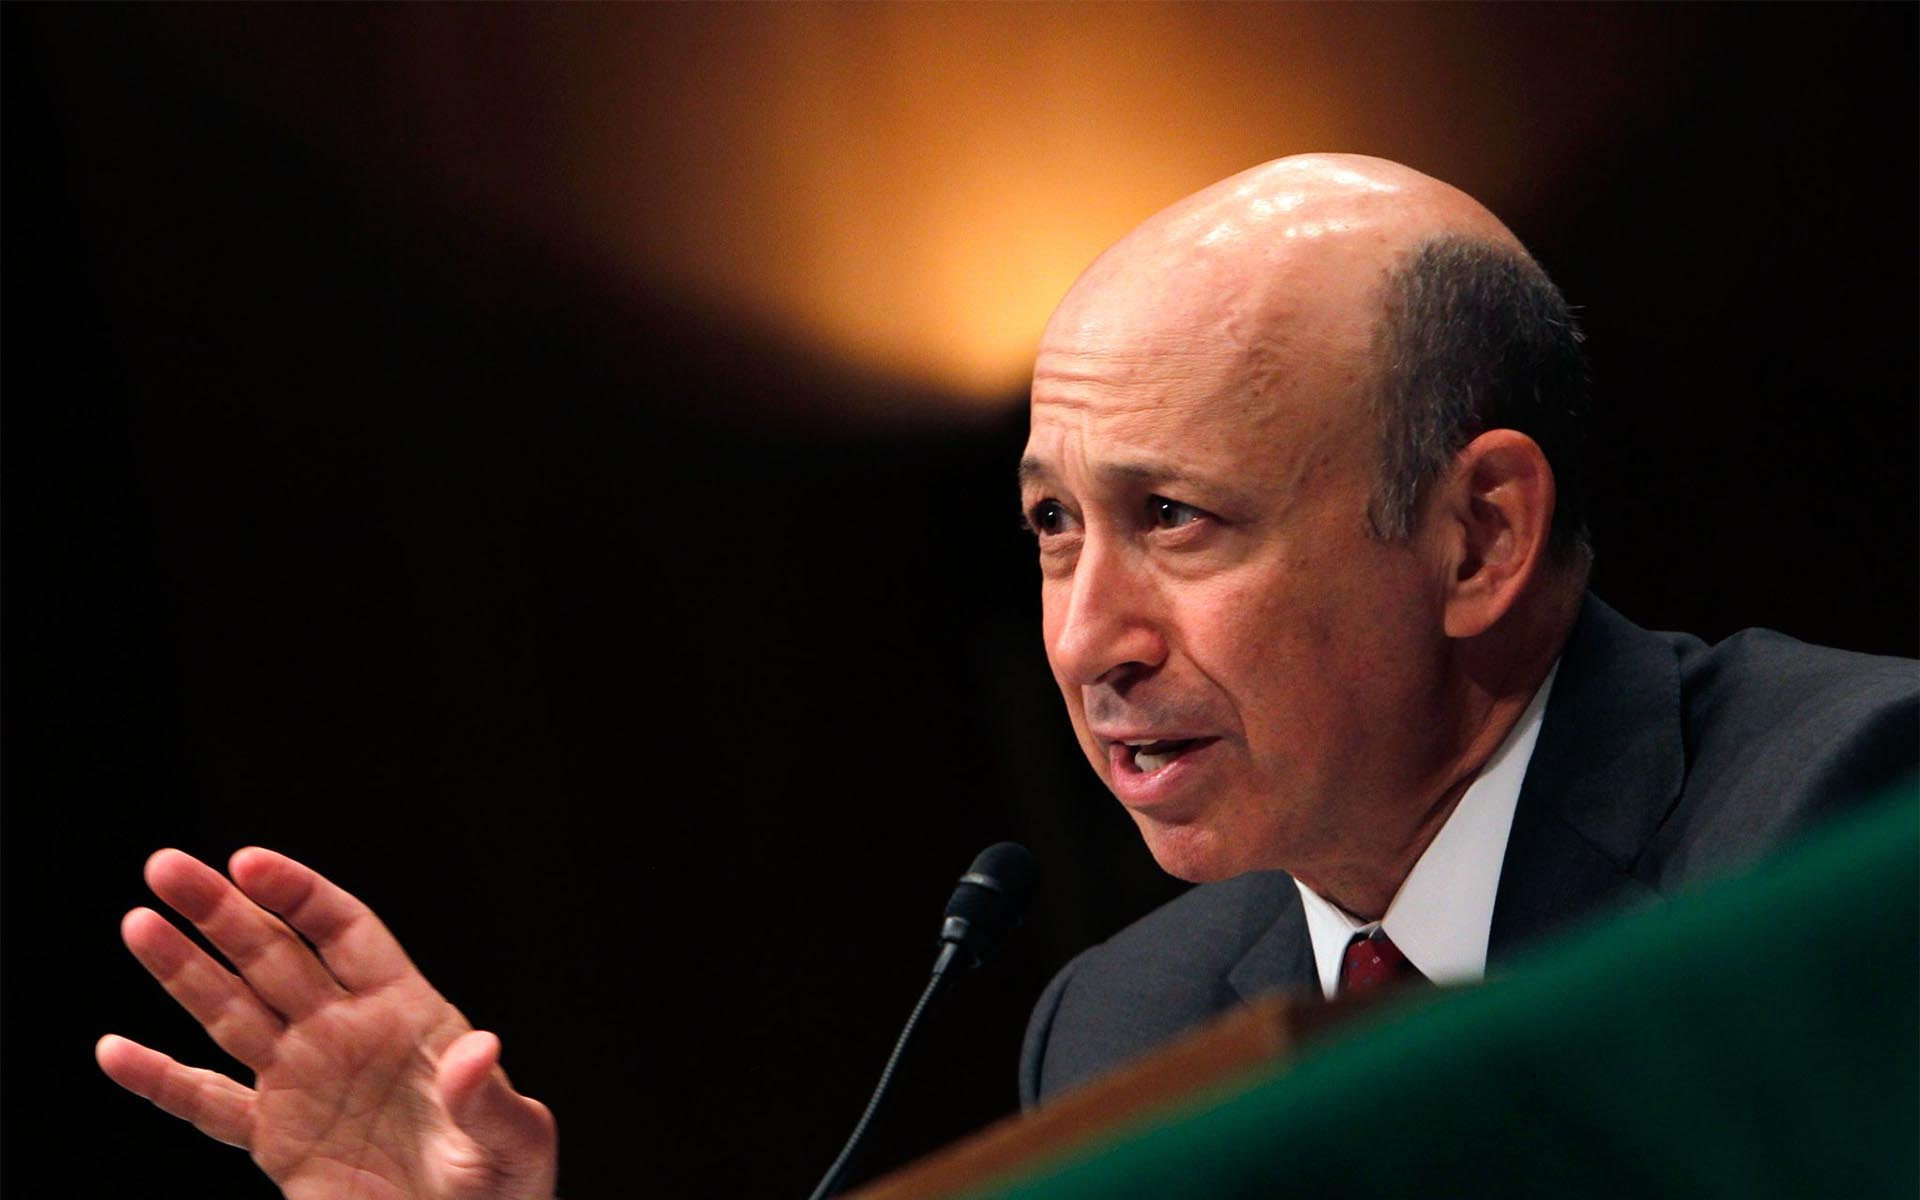 Goldman Sachs CEO Lloyd Blankfein Hints At Bitcoin Revolution